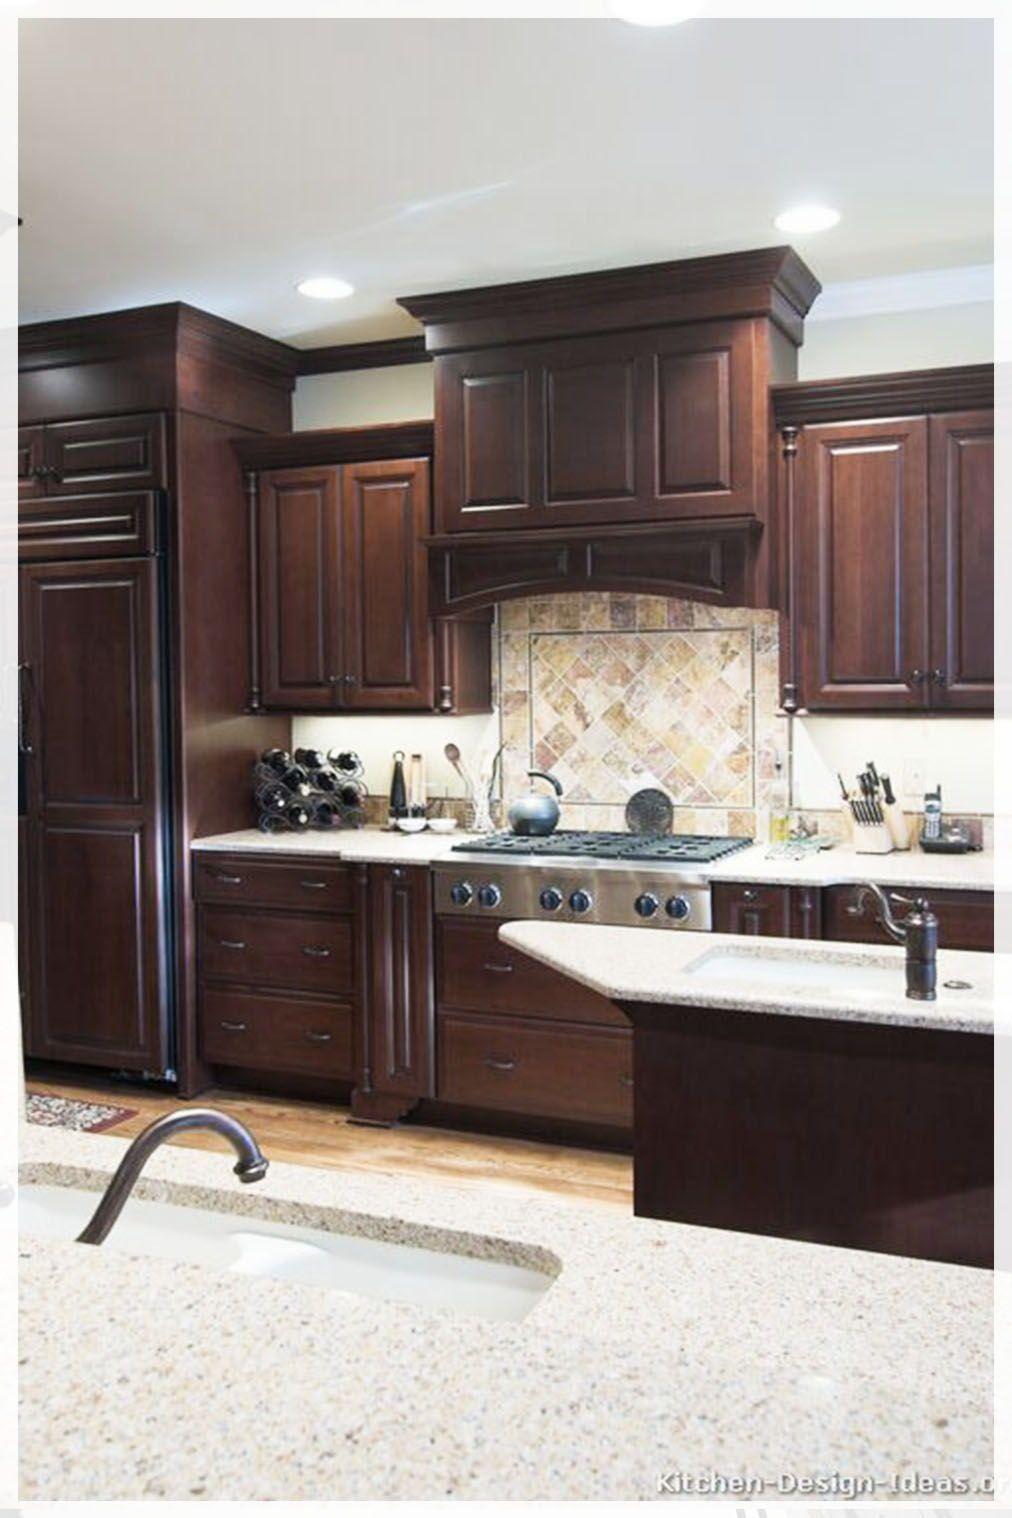 20 Stunning Industrial Style Kitchen 2020 Trends Key Elements Design Ideas Cherry Cabinets Kitchen Cherry Wood Kitchen Cabinets Cherry Wood Cabinets